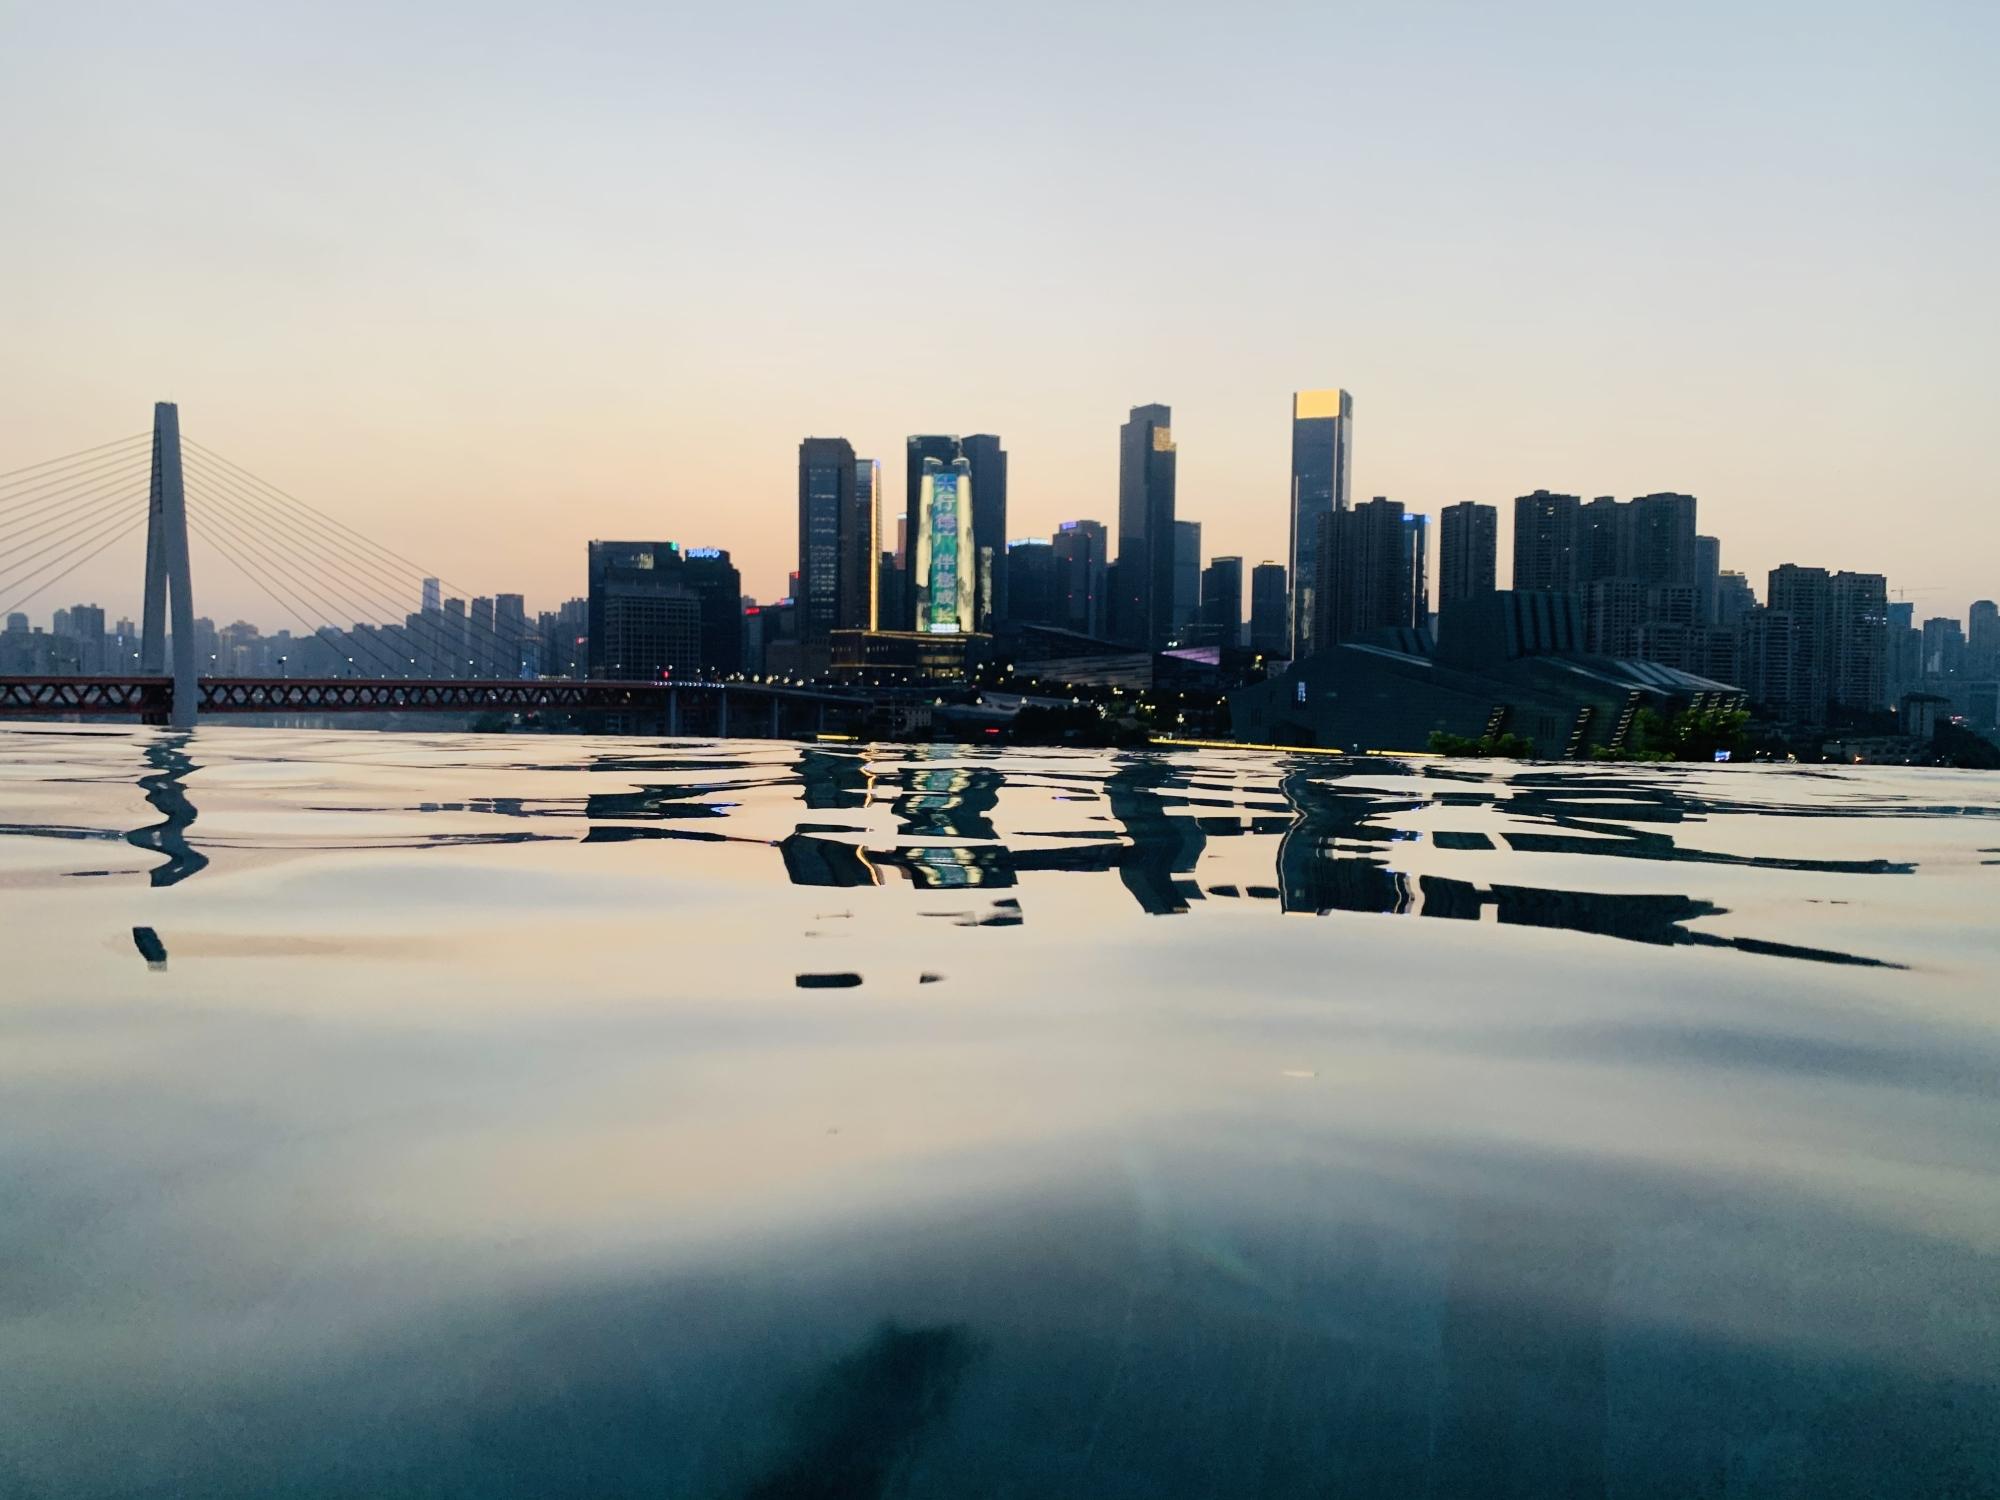 Incredible night view from Raffles City of cyberpunk Chongqing!